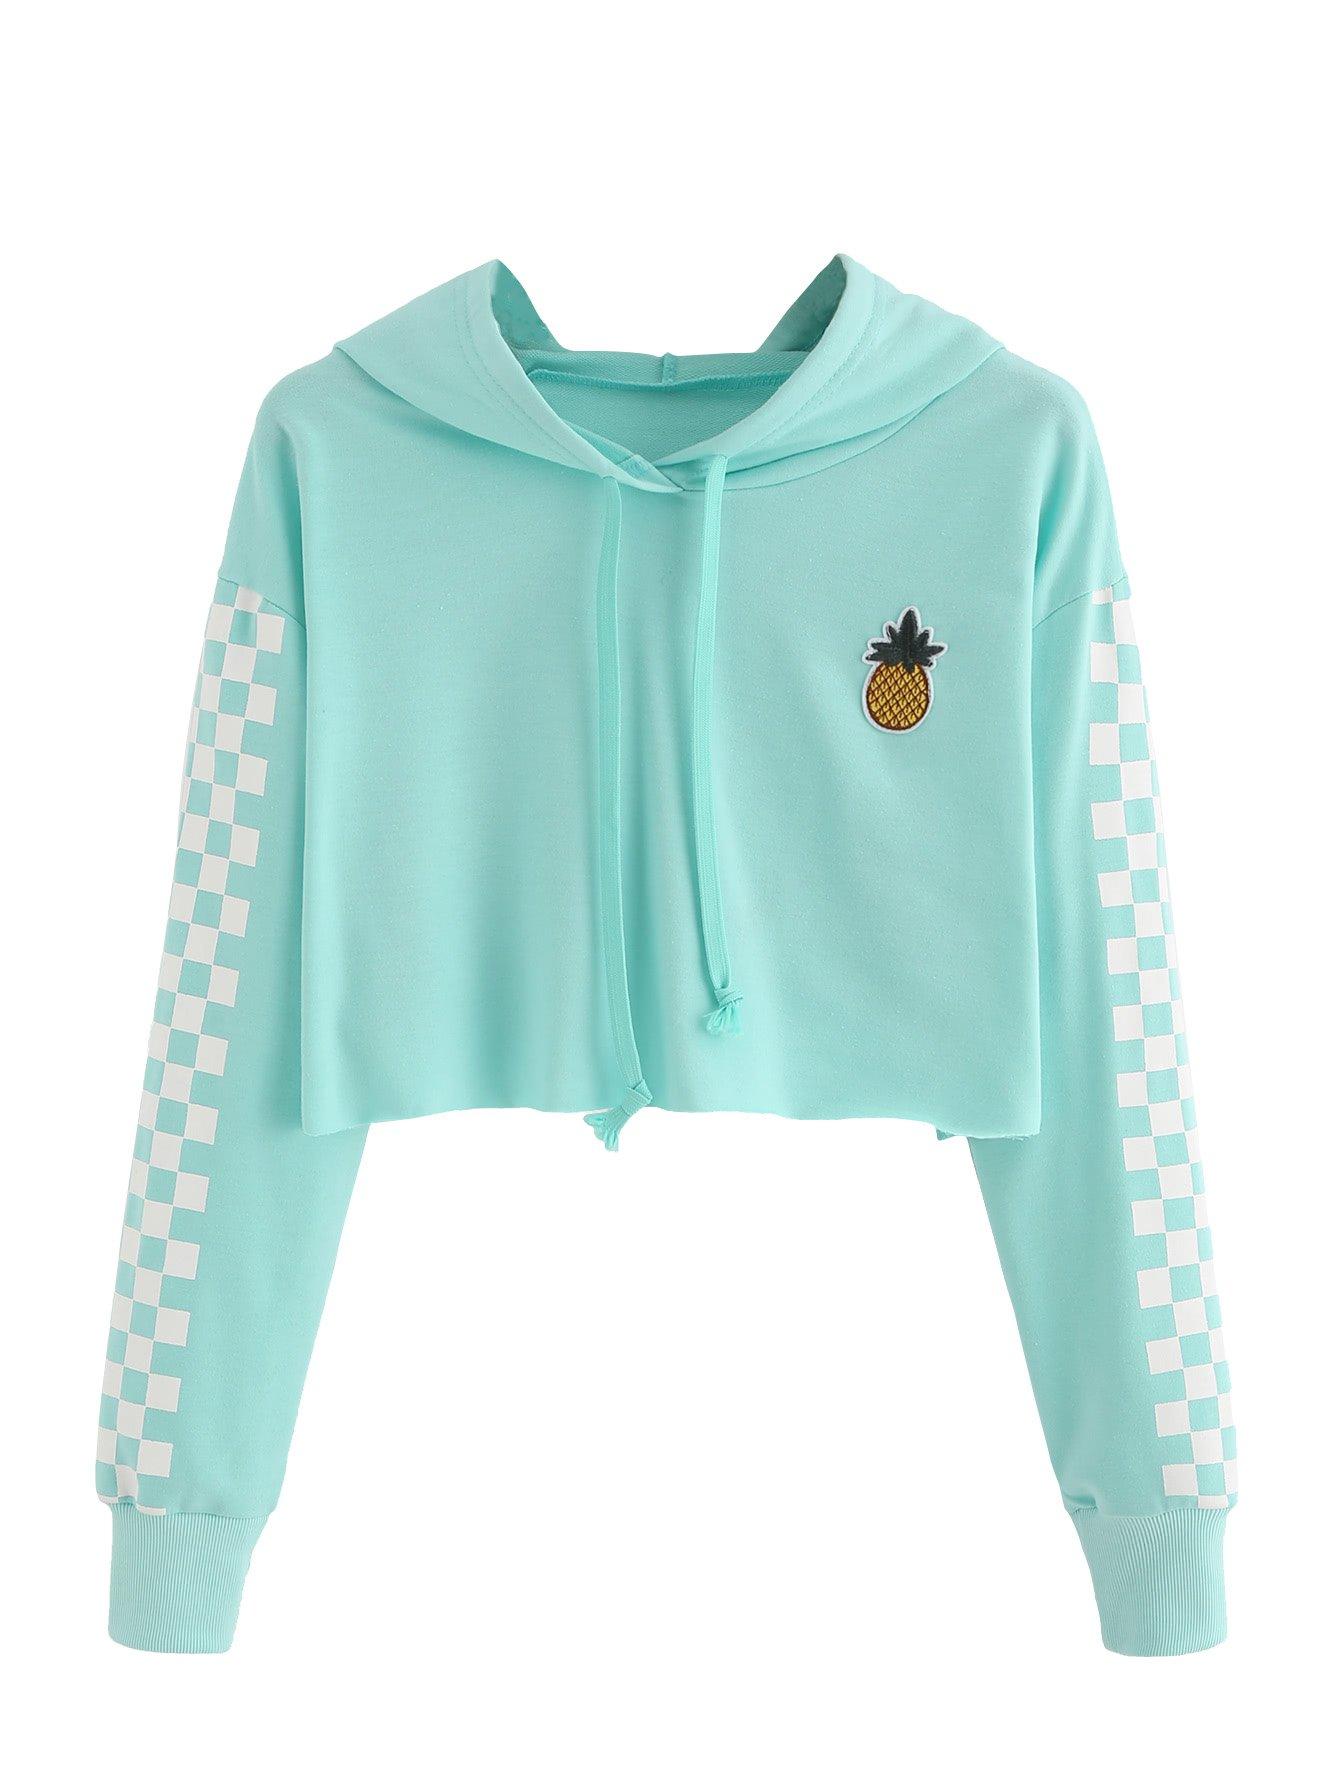 MakeMeChic Women's Pineapple Embroidered Hoodie Plaid Crop Top Sweatshirt Blue S